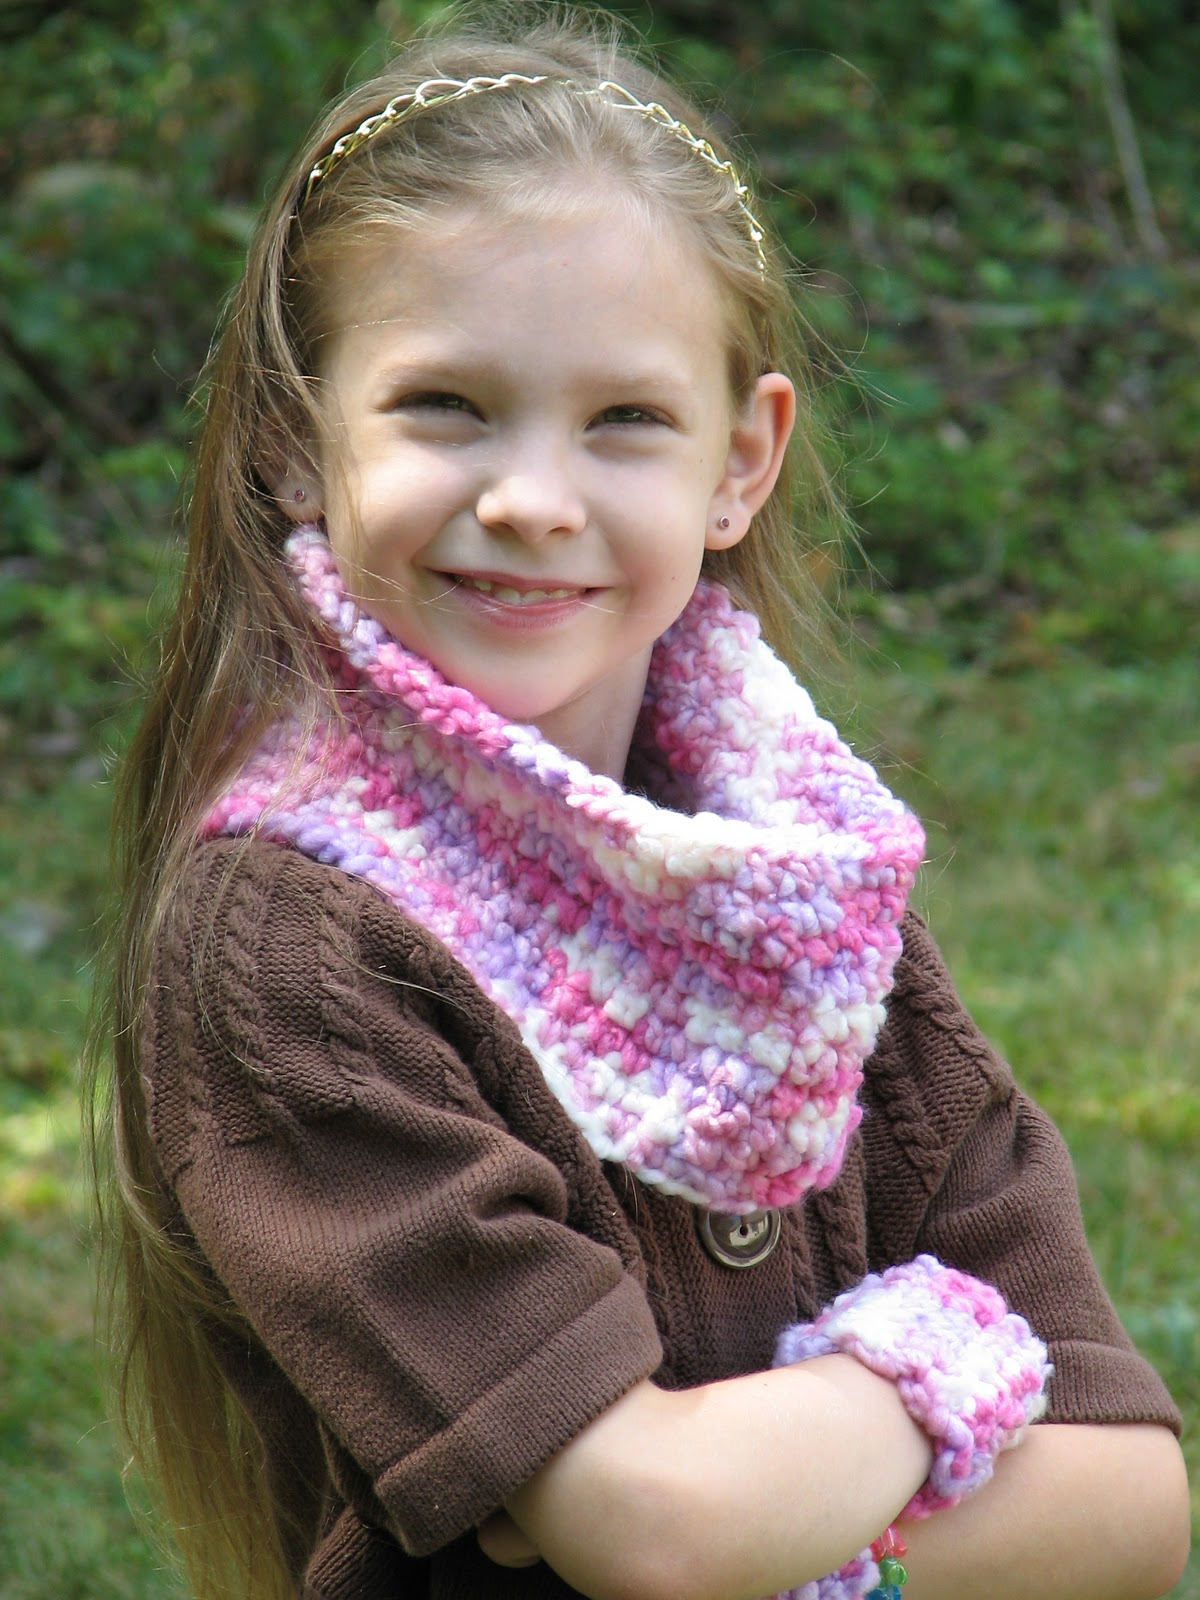 Crochet Cowl & Wristlets - Free Crochet Pattern - Ambassador Crochet